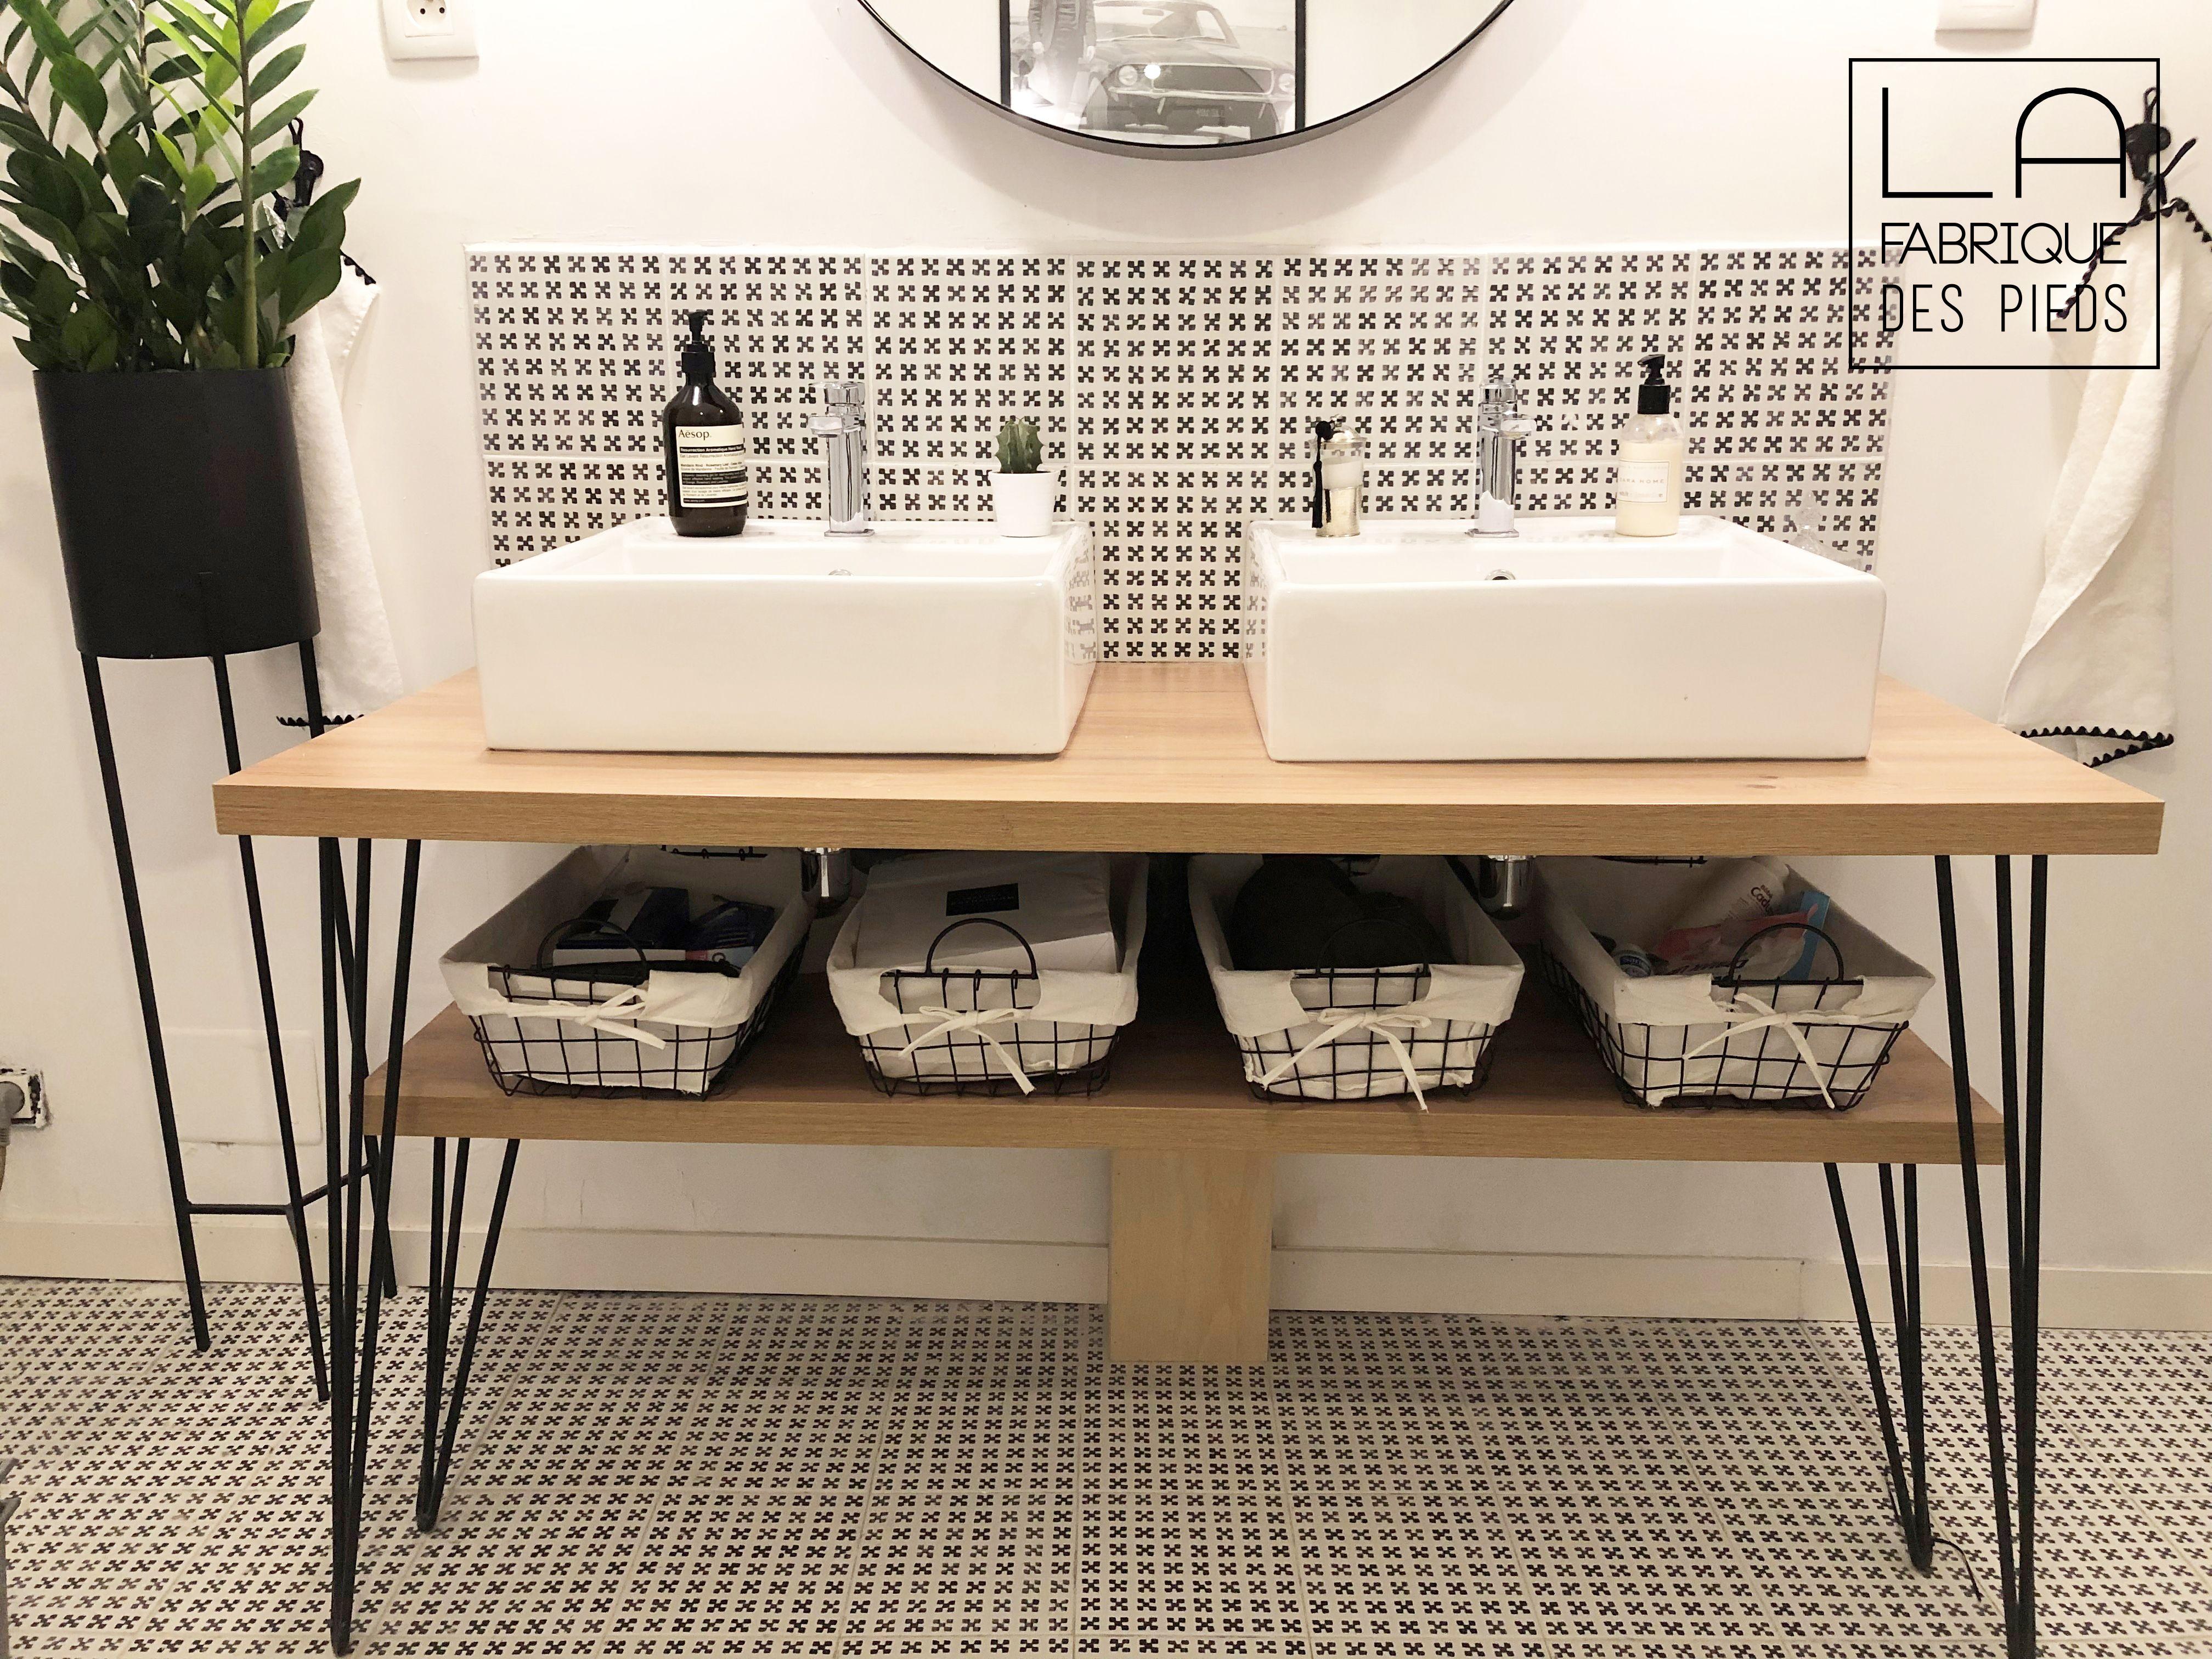 Pied Epingle Renforce Sur Mesure De 25 A 110 Cm En 2020 Meuble Vasque Diy Meuble Salle De Bain Et Idee Salle De Bain